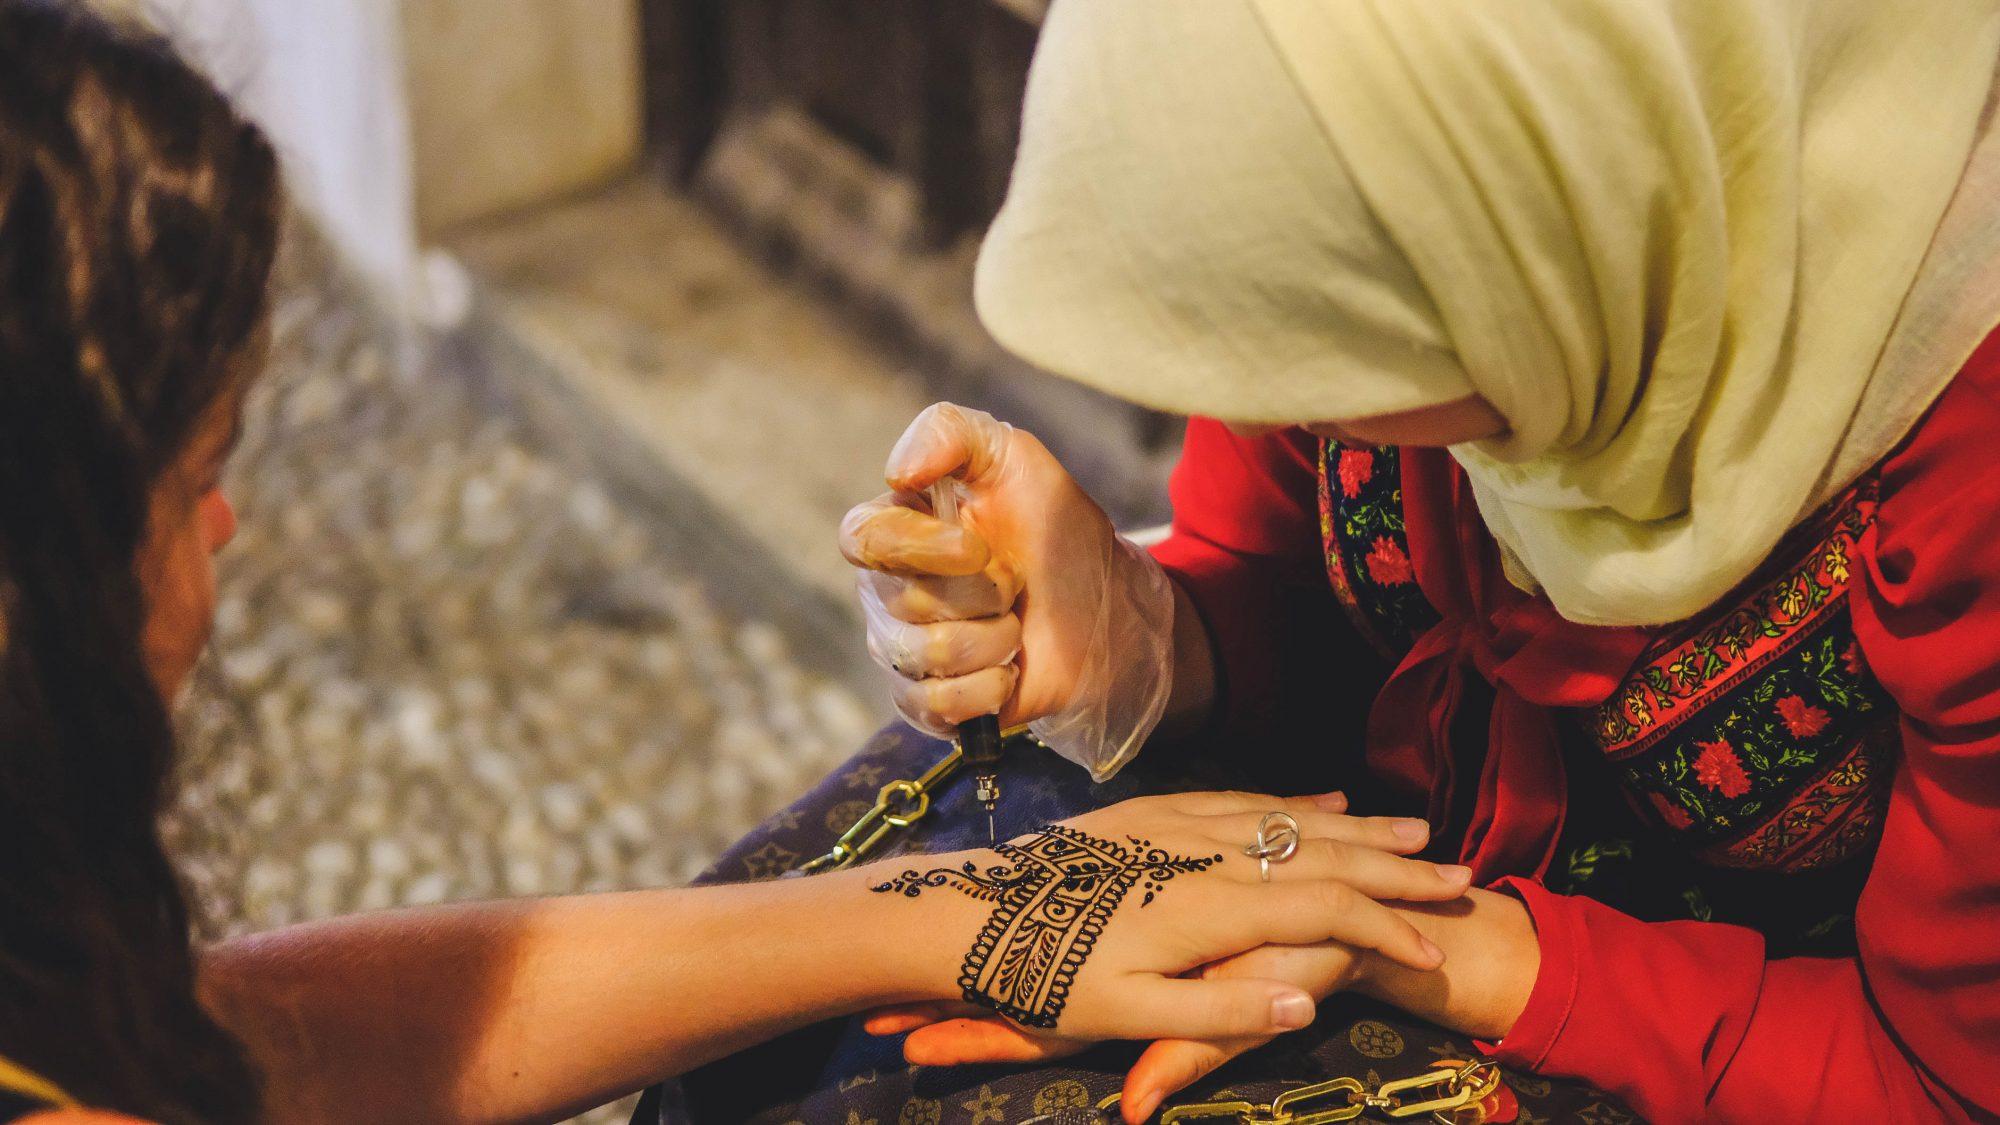 Street Tattoo au Henné - Grenade, Espagne